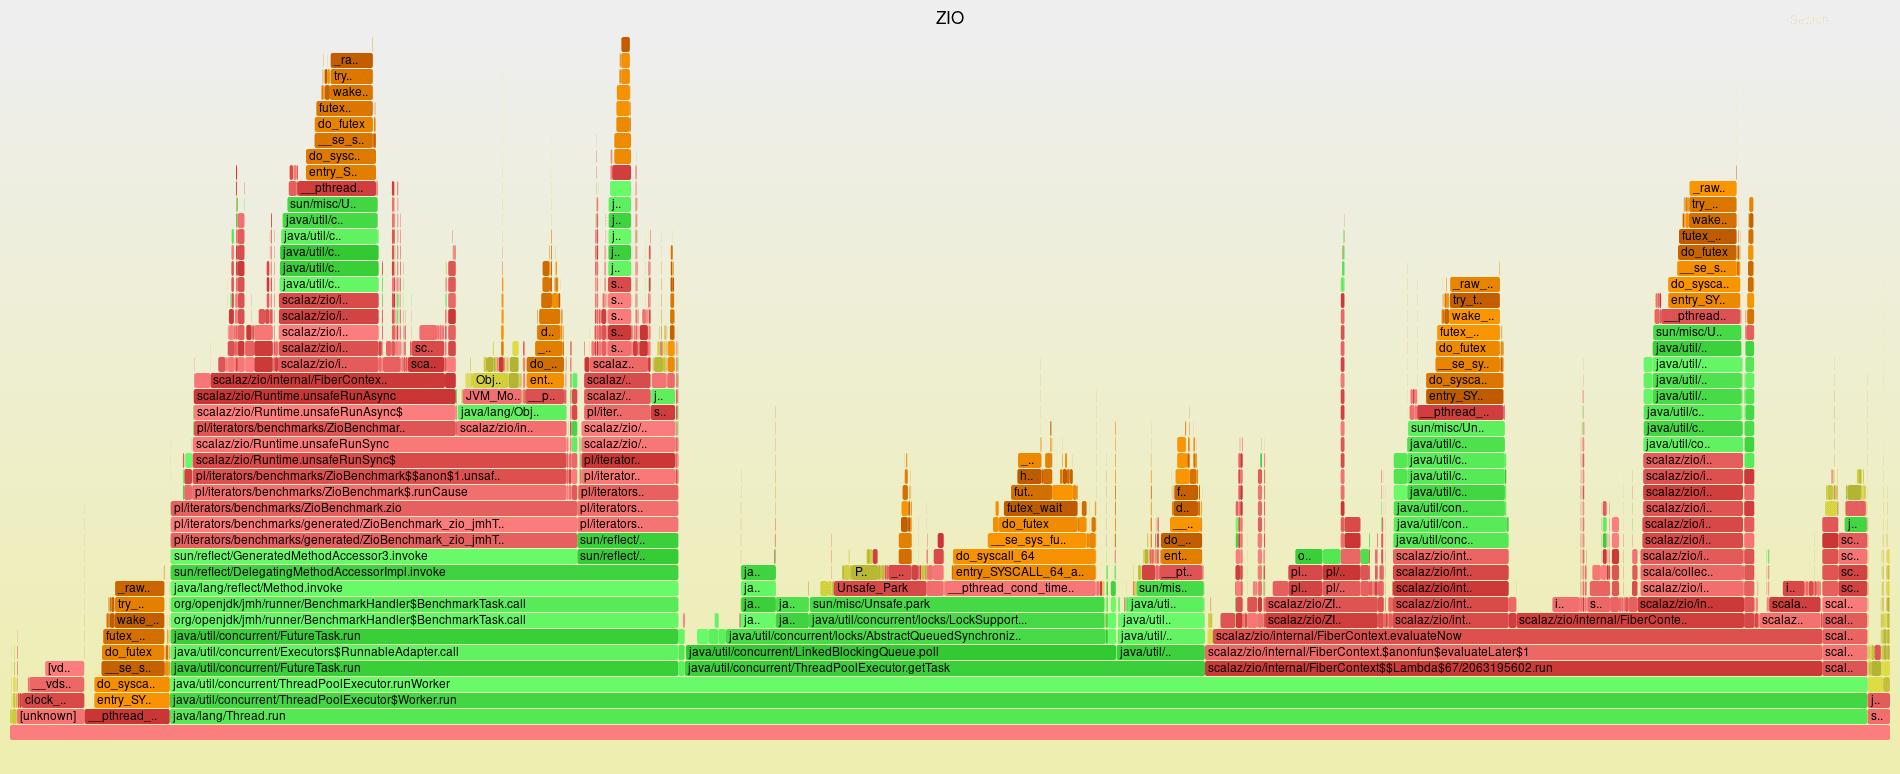 Flame graph of ZIO